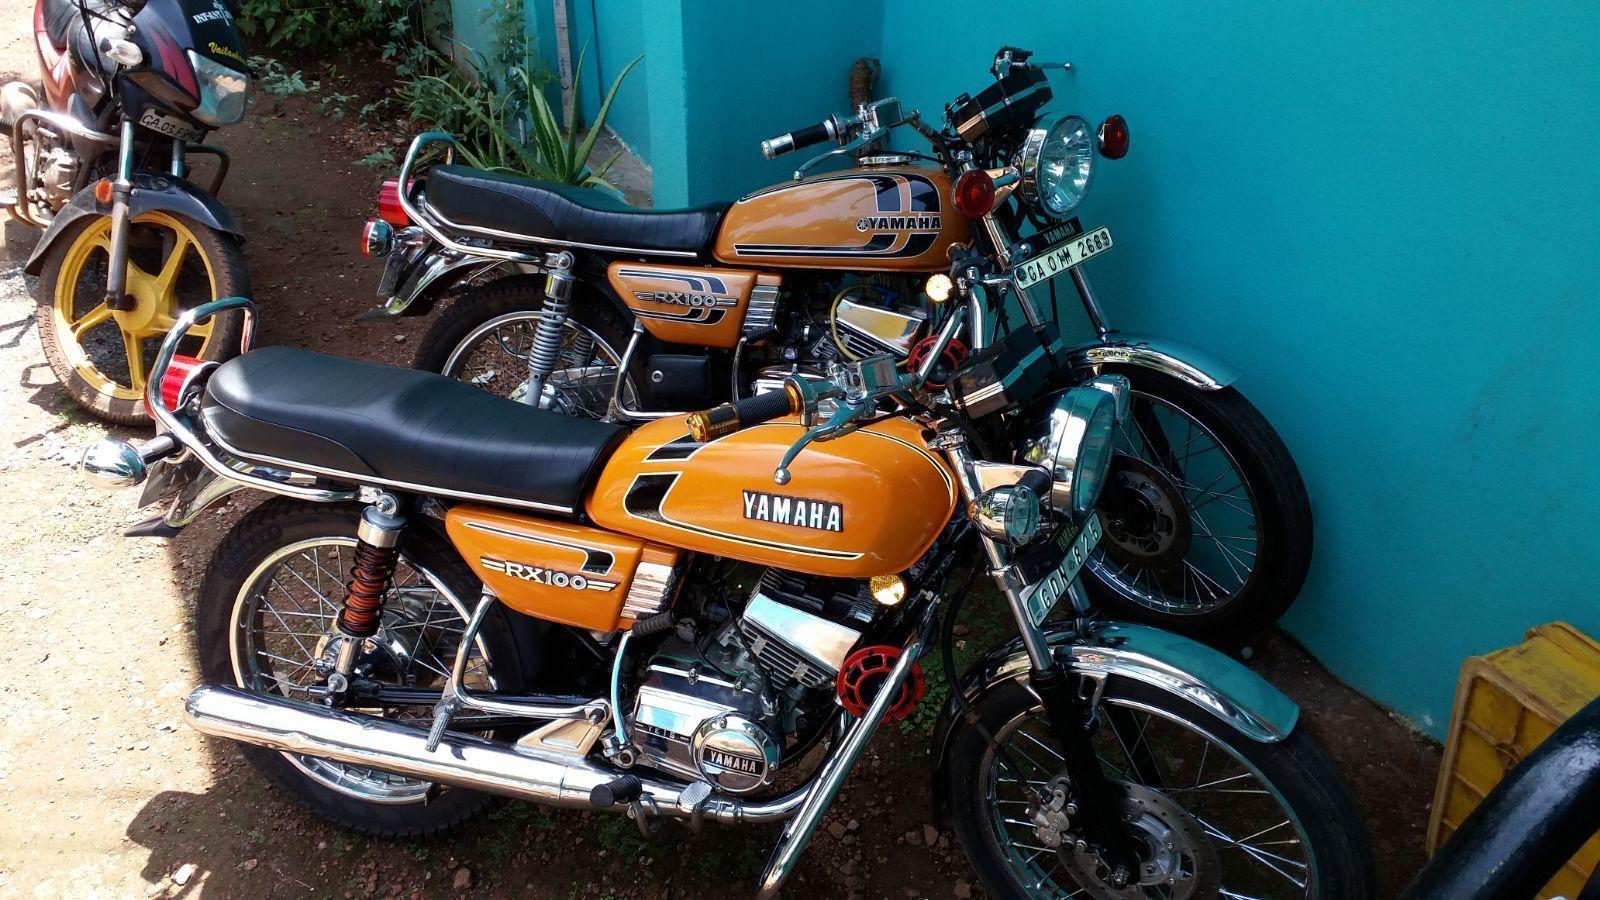 Yamaha RX100 Wallpapers